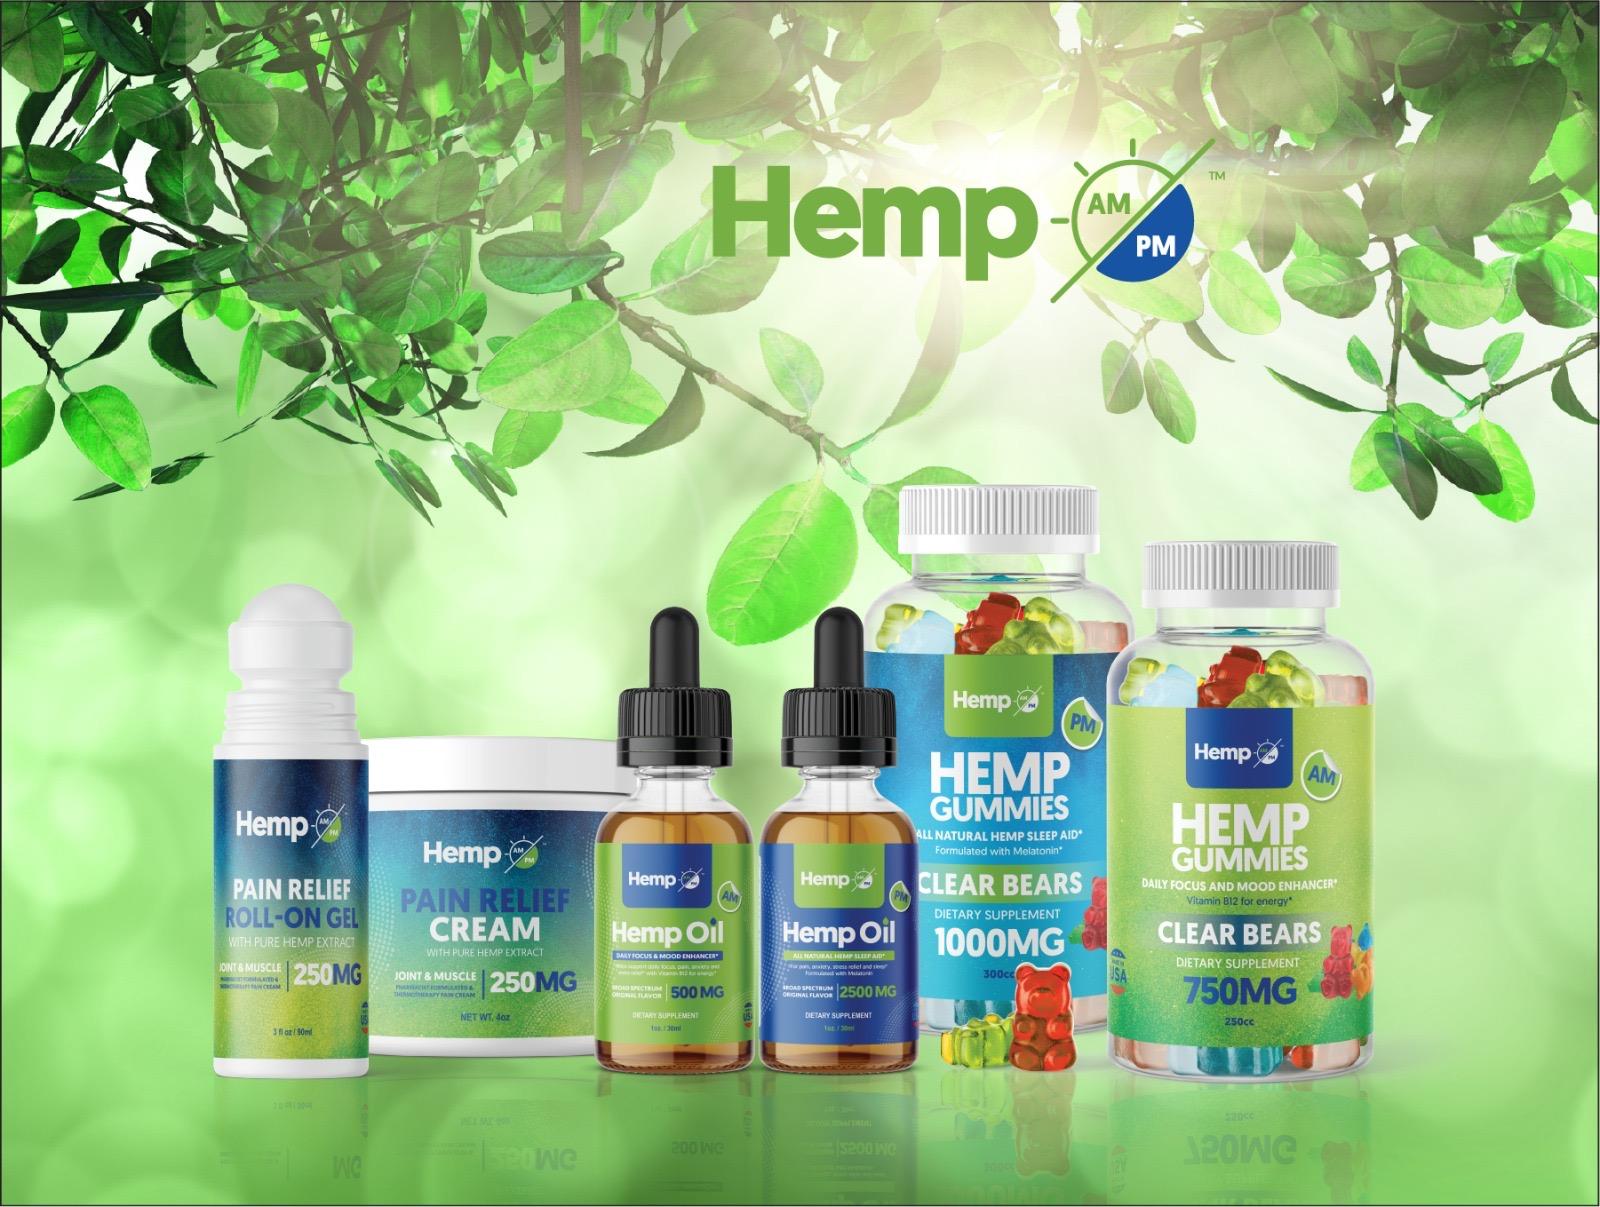 HempAMPM Affiliate Program